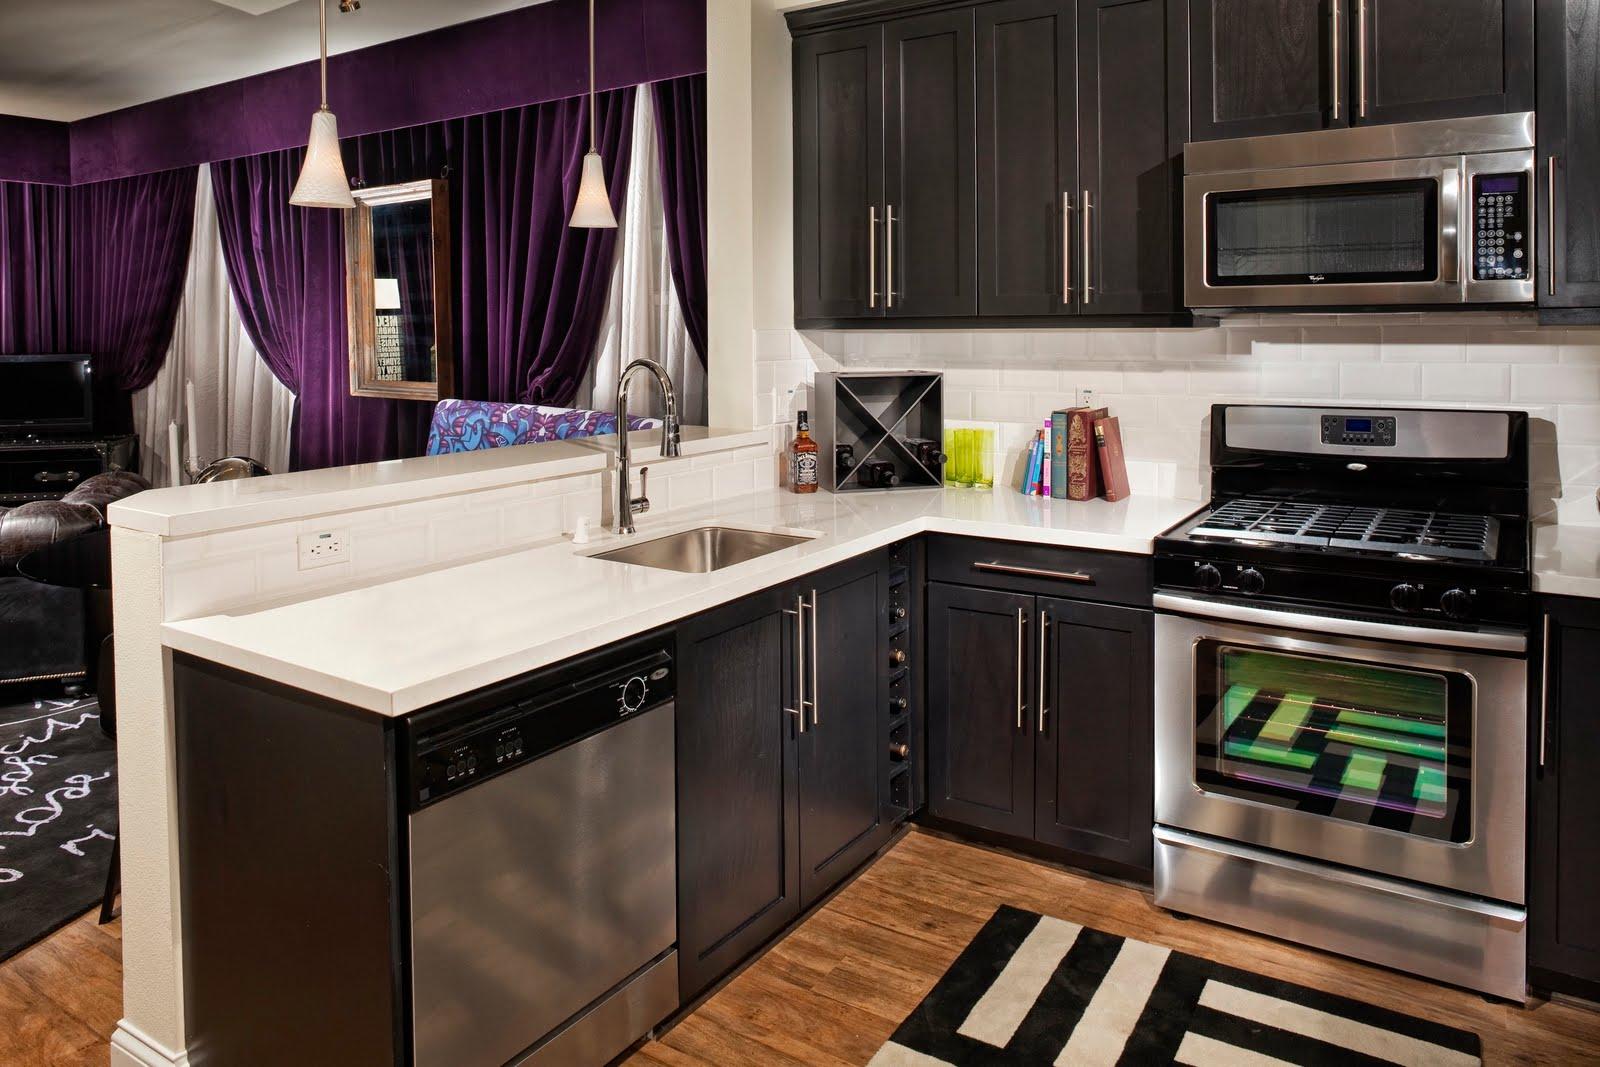 black kitchen cabinets in small kitchen photo - 6